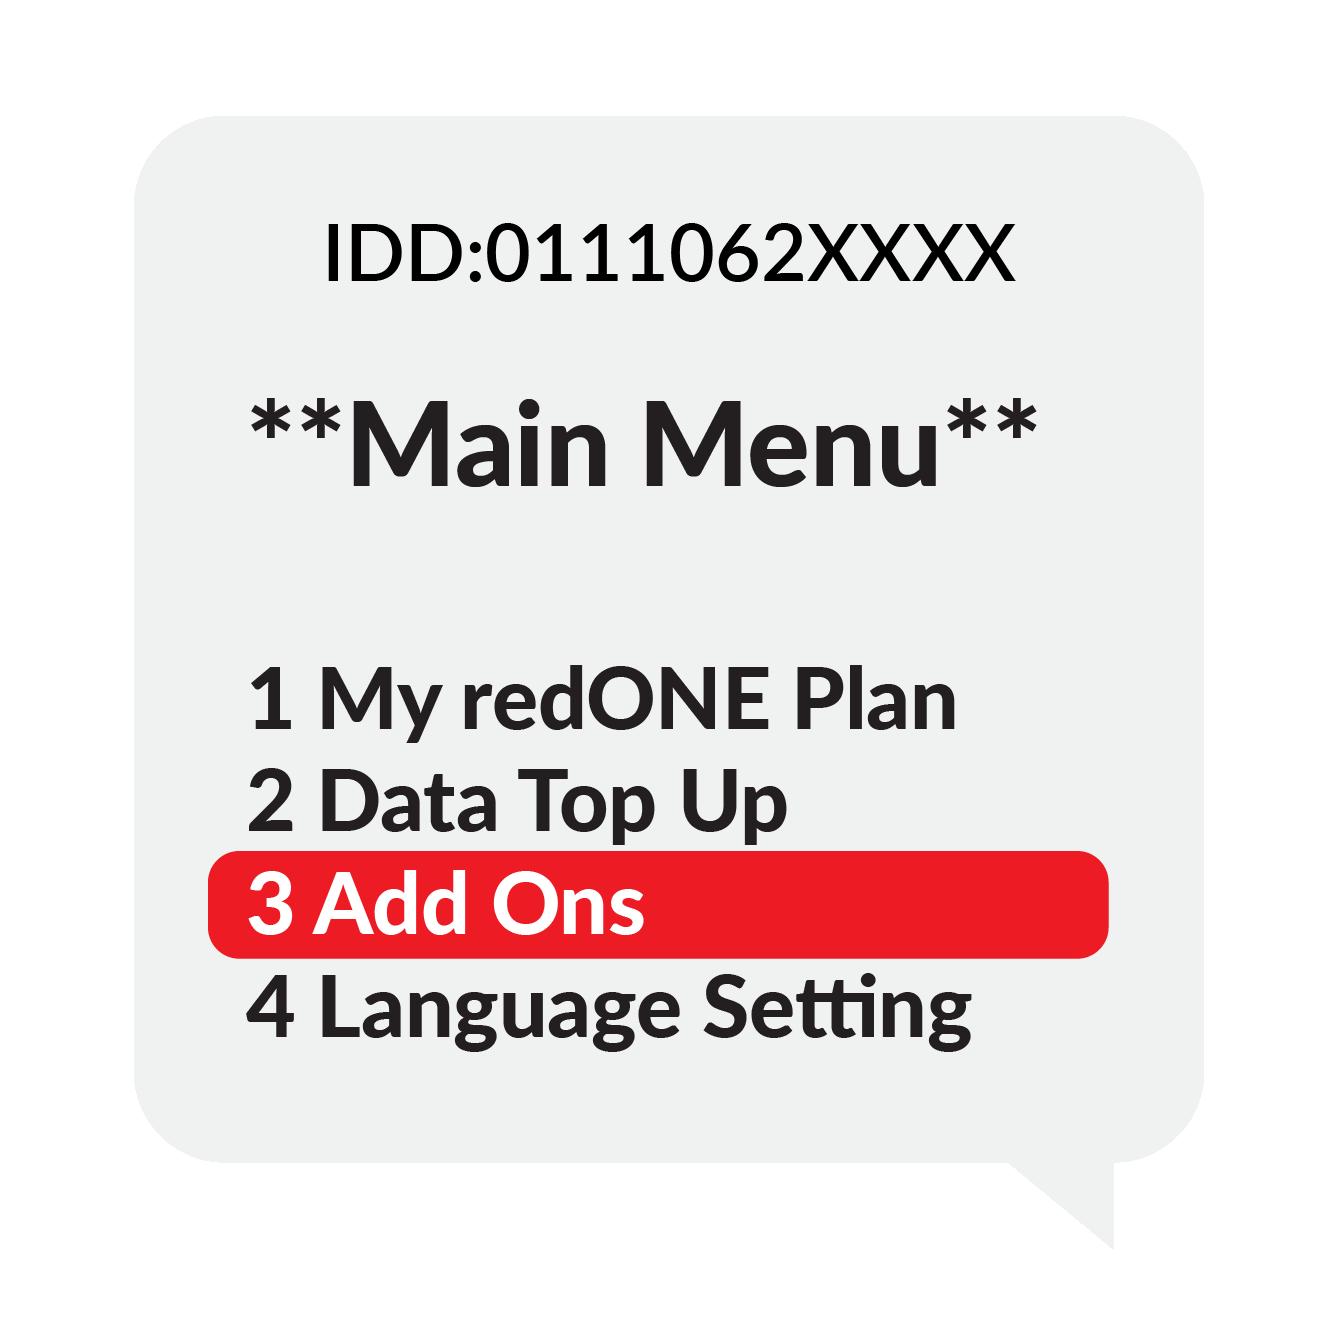 "Step 2 ""Main Menu"", 1.My redONE Plan 2.Data Top Up 3.Add Ons 4.Language Setting, Select 3 Add Ons"